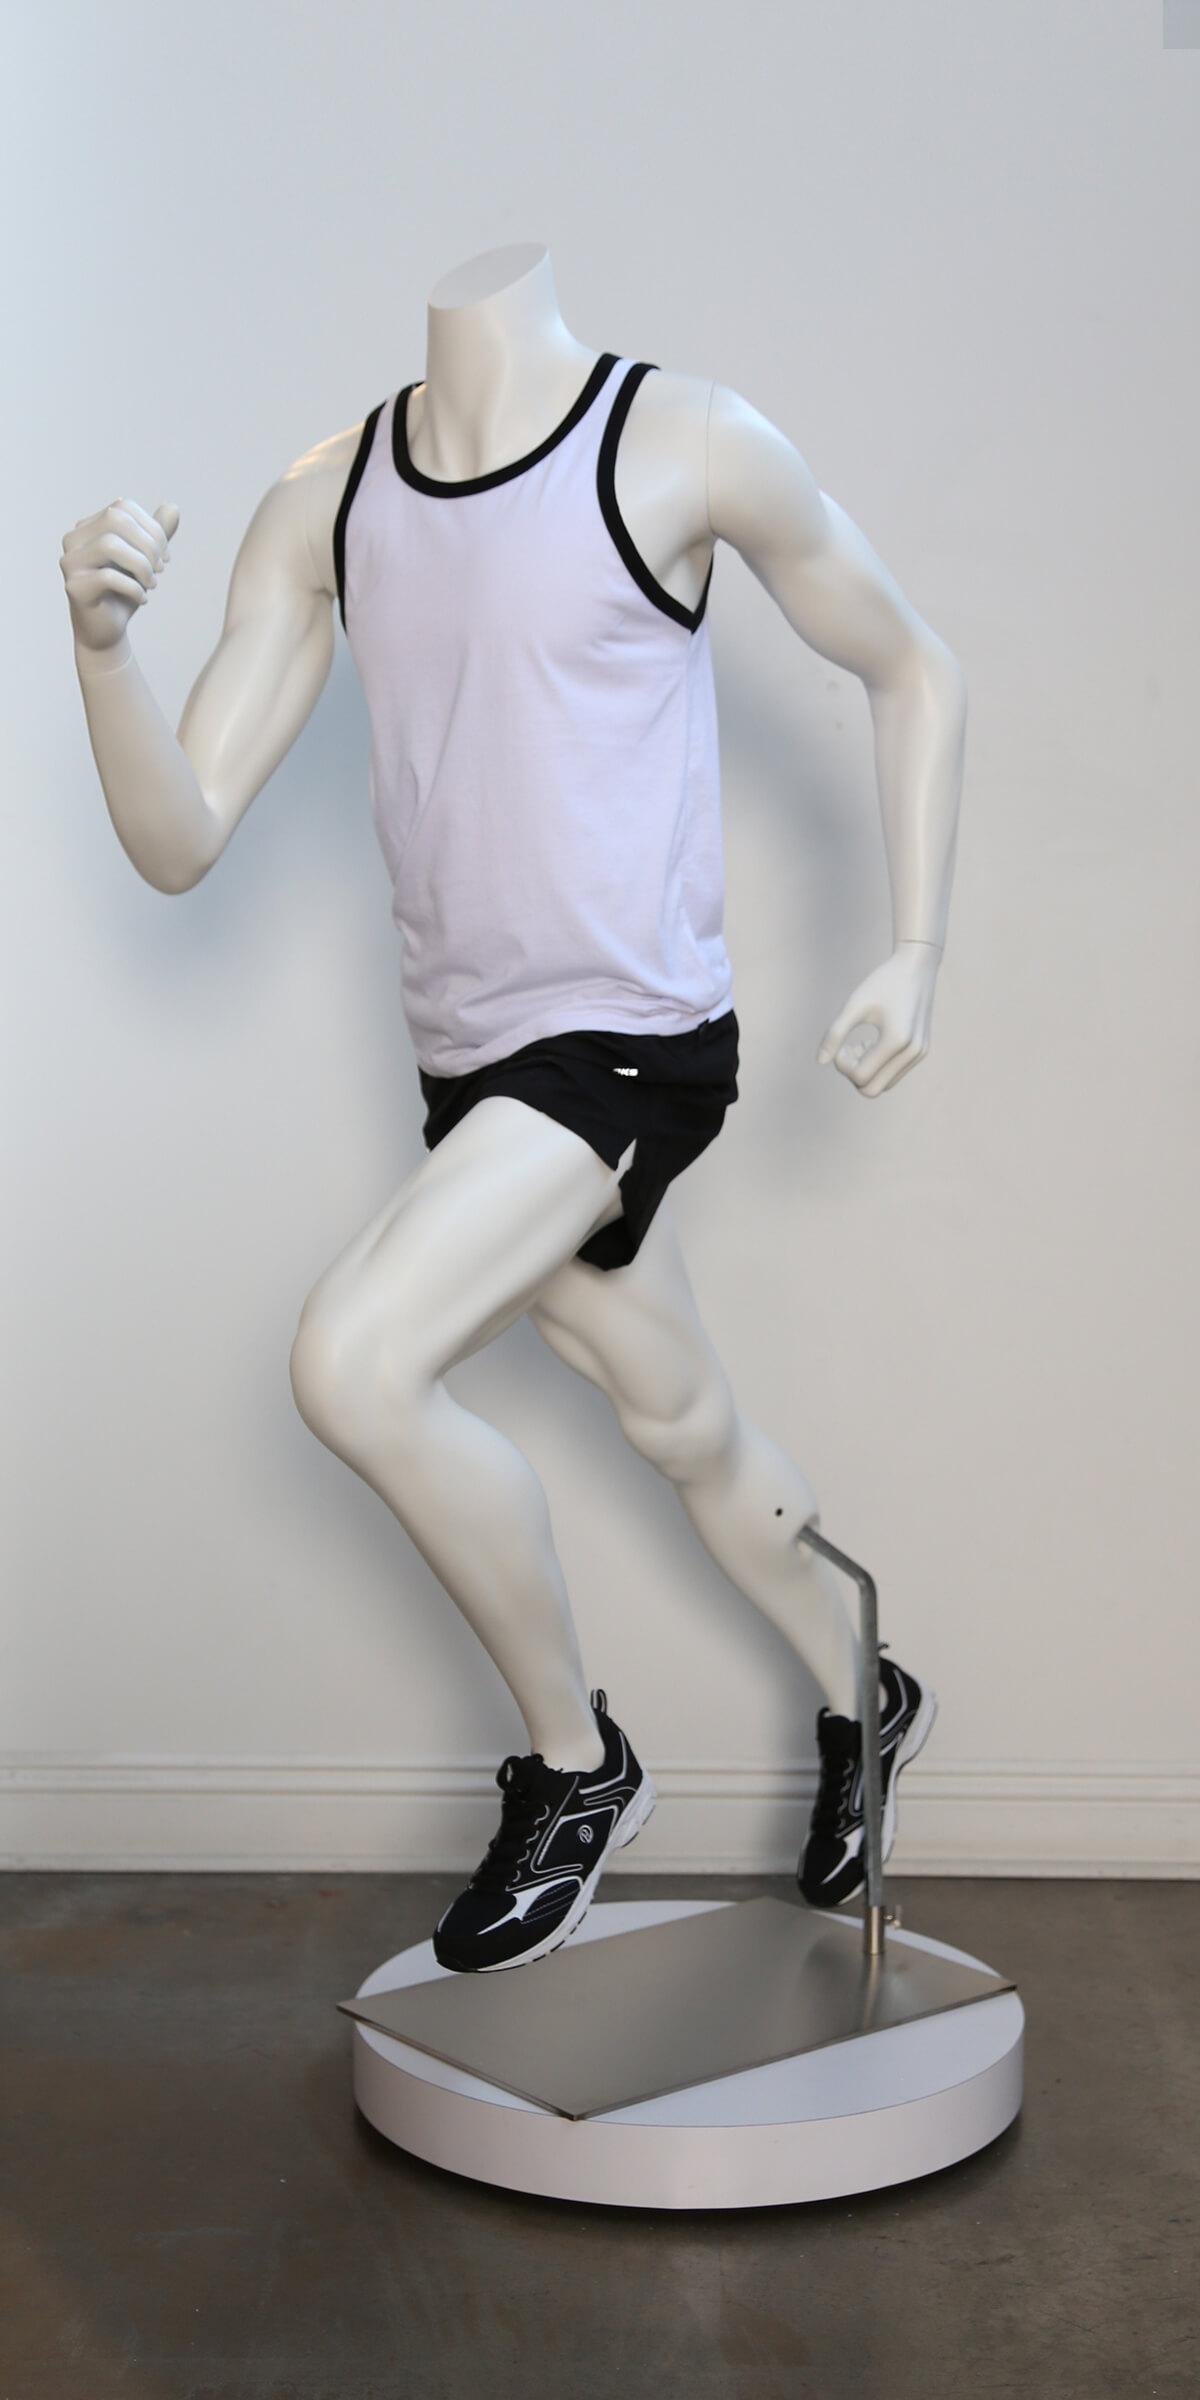 RUN-M3 Dressed